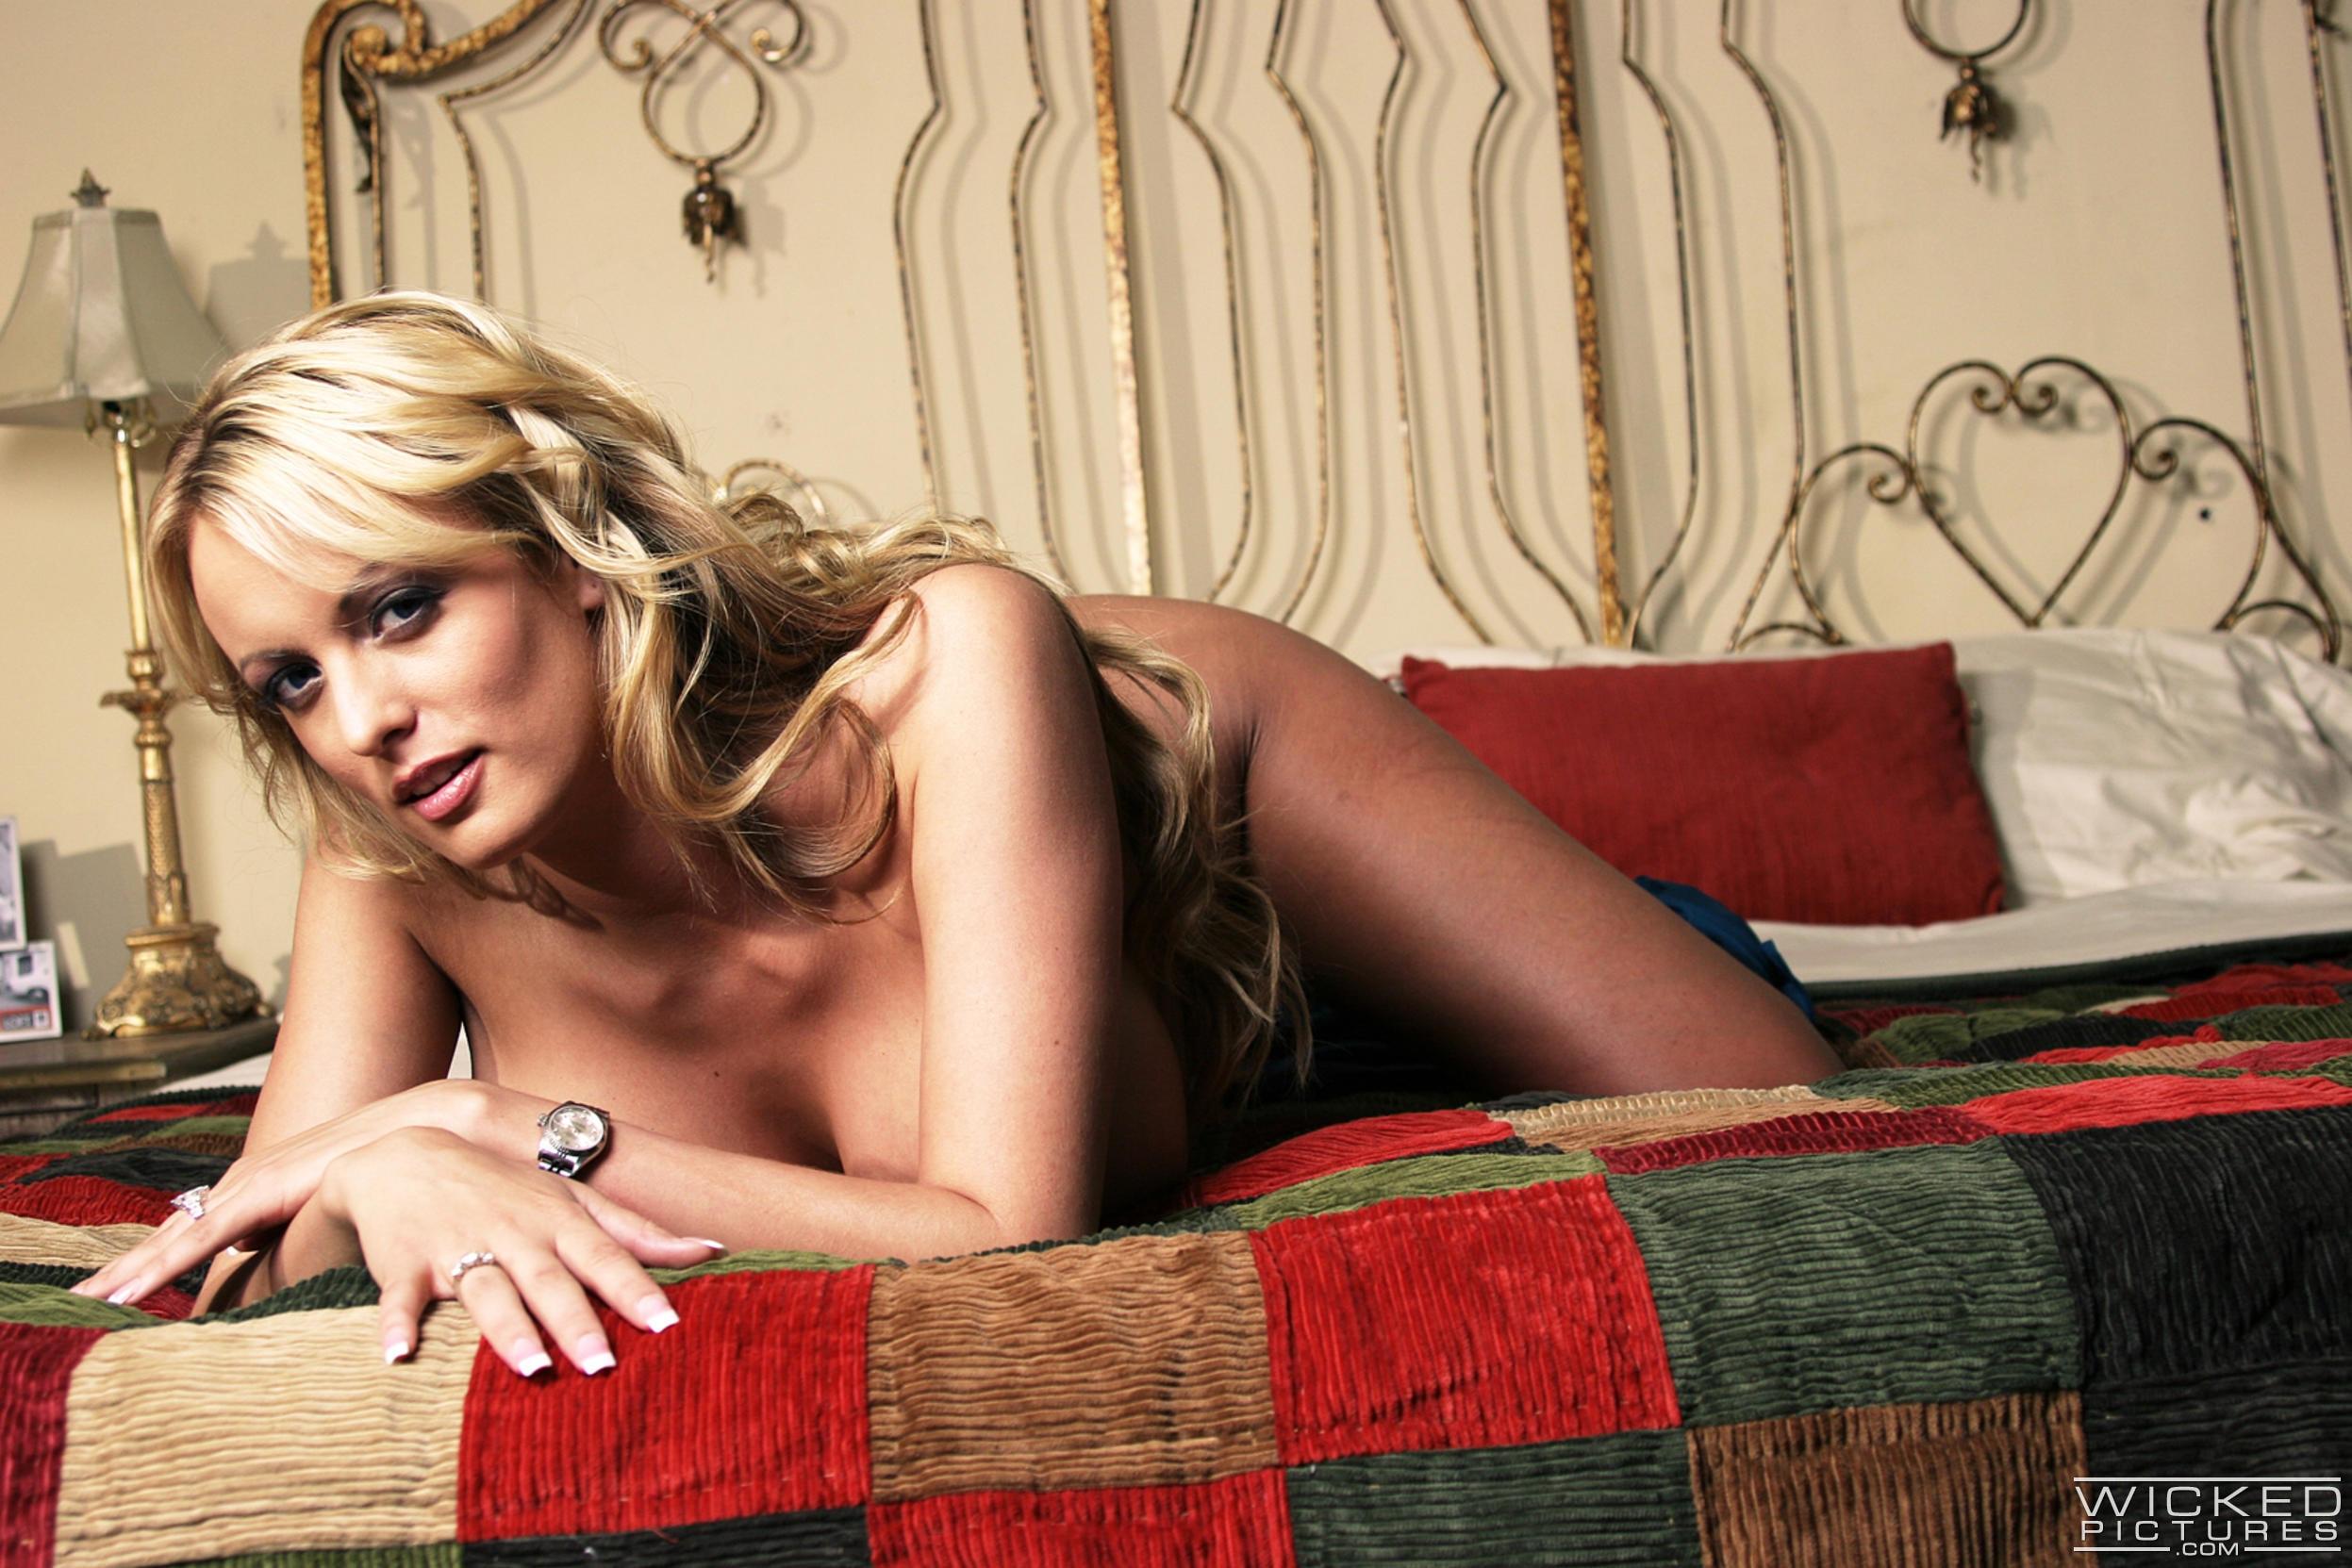 Wicked 'Watching Samantha Scene 1' starring Stormy Daniels (Photo 6)